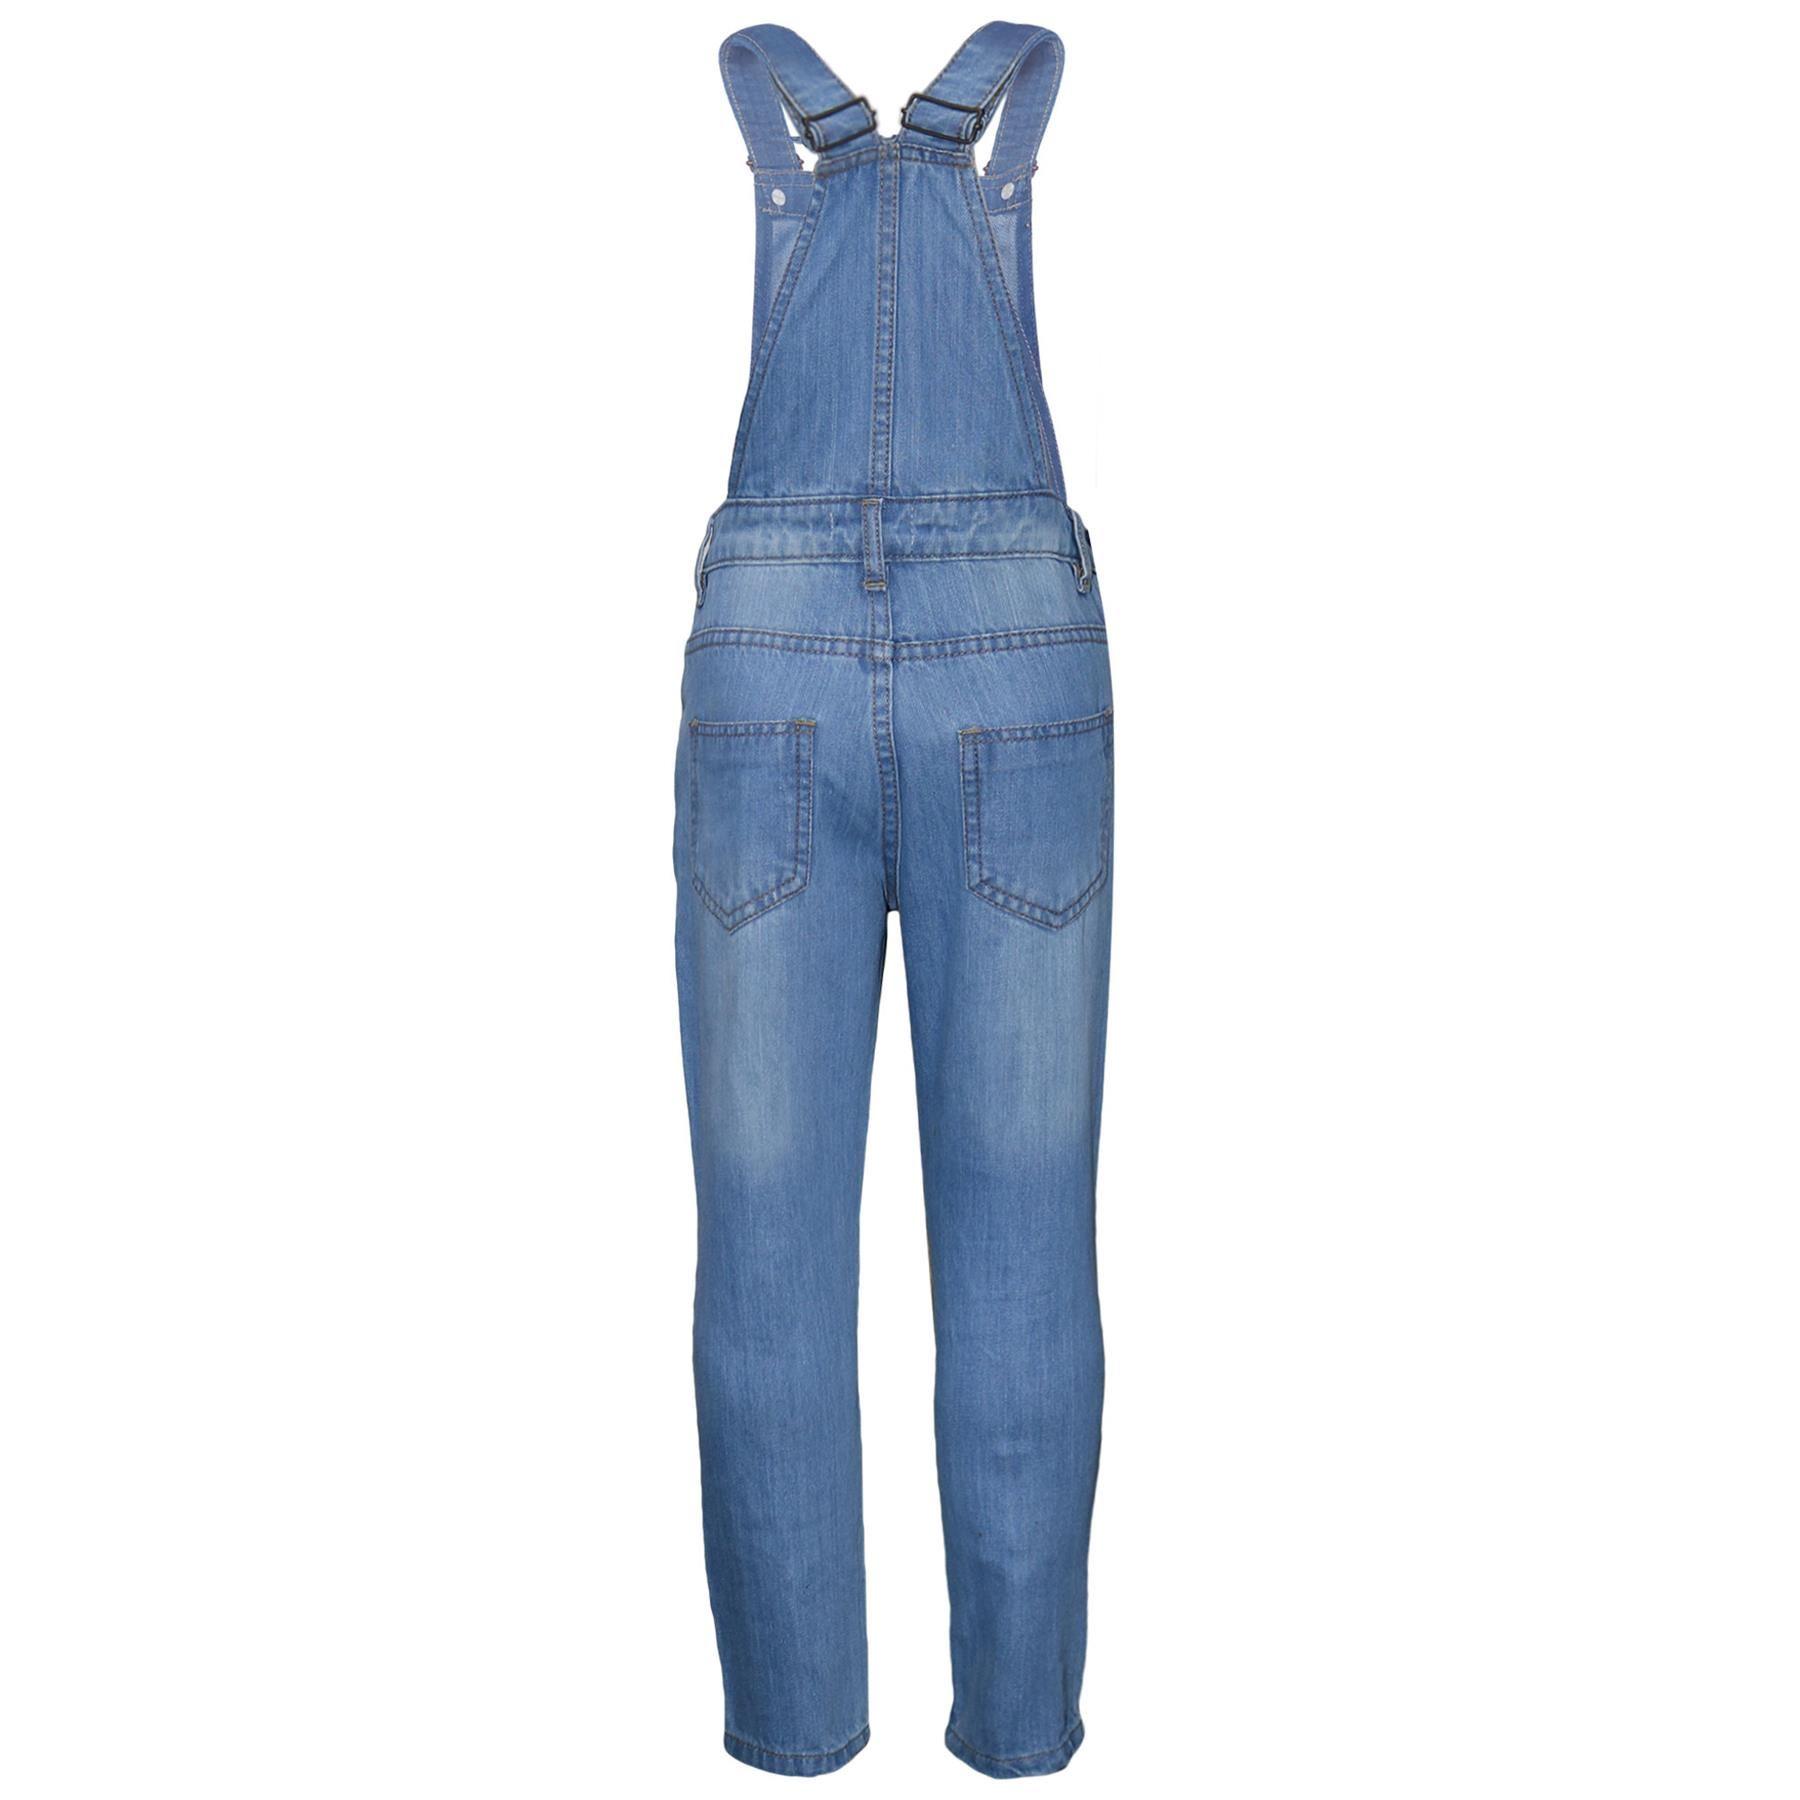 Indexbild 3 - Kinder Mädchen Denim Latzhose Zerrissen Hellblau Jeans Overall Mode Overall 5-13